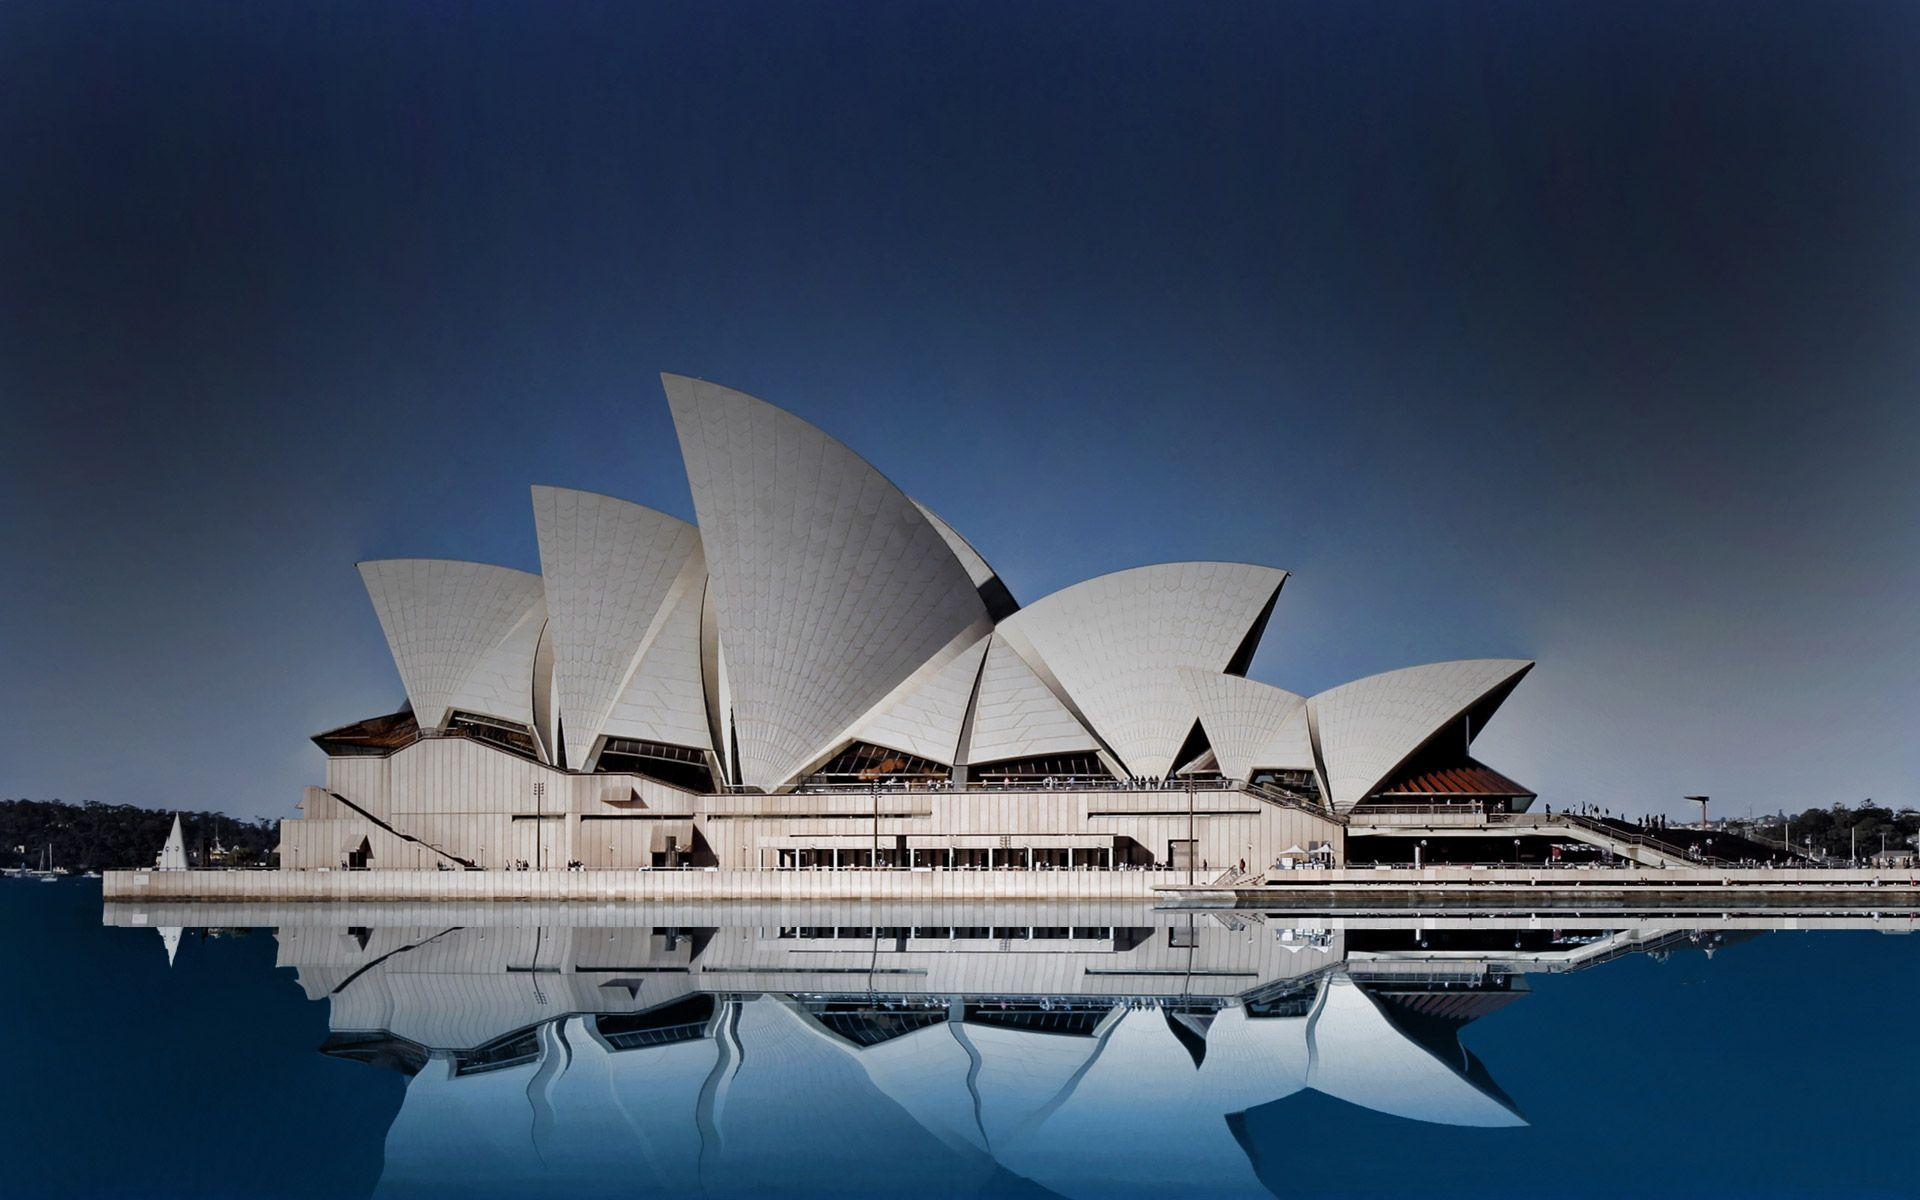 l21qa46 - 25+ Sydney Opera House Hd Images  Background